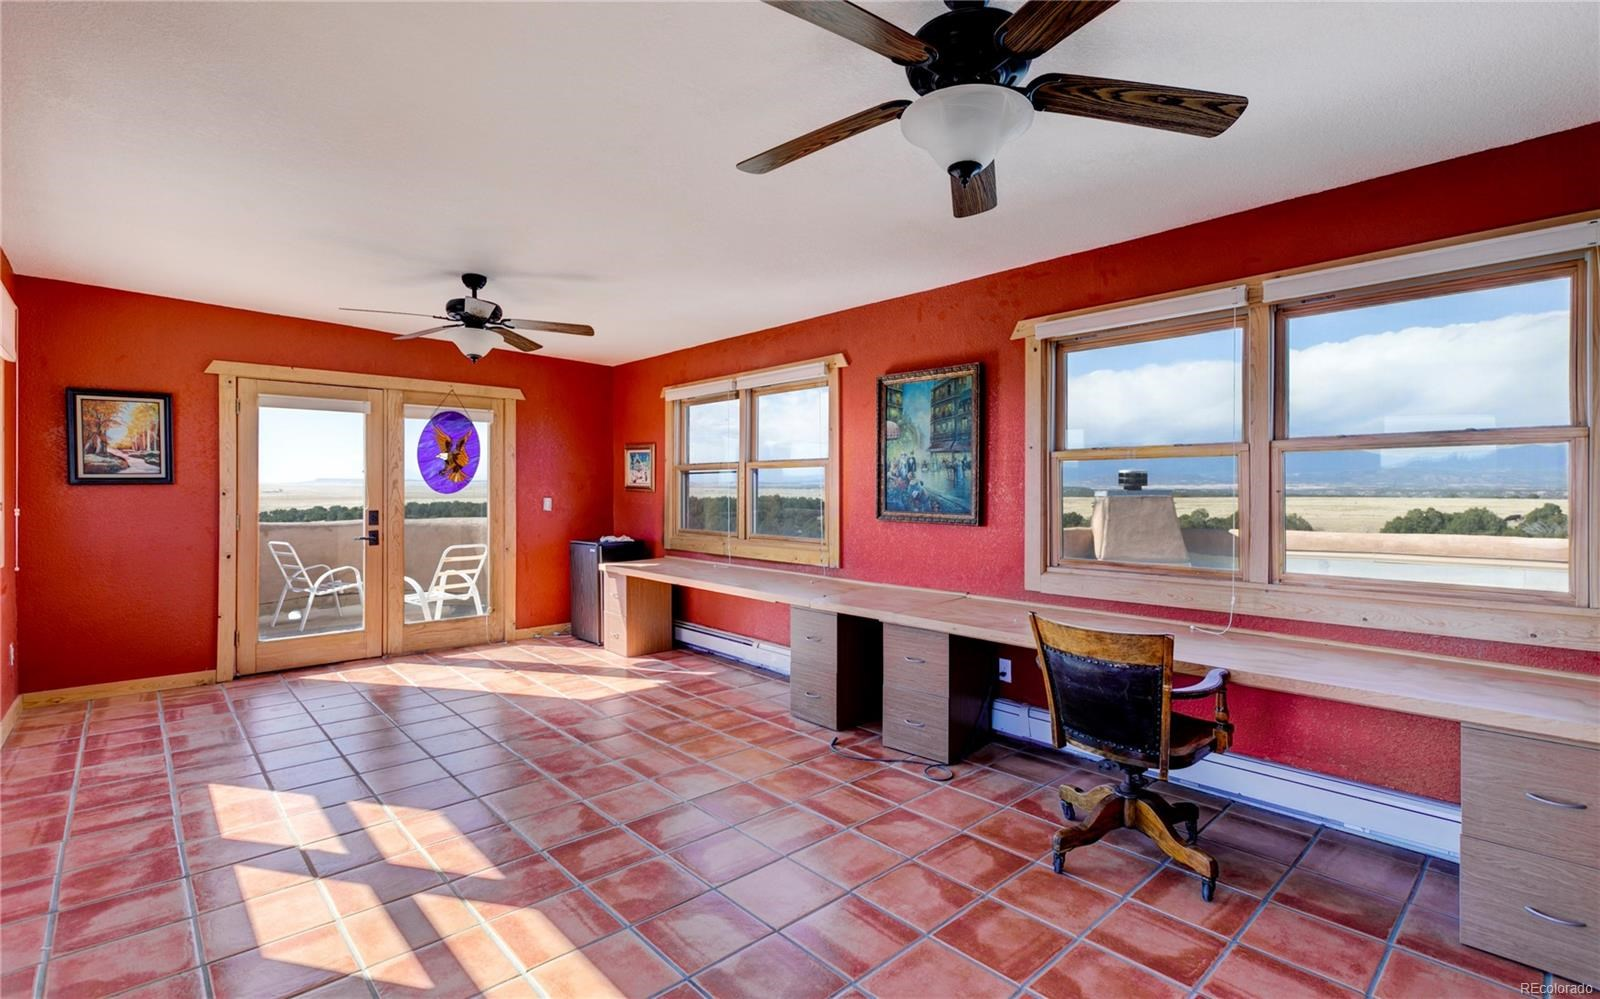 MLS# 3090448 - 26 - 7708 Sunset Ridge Drive, Pueblo, CO 81004